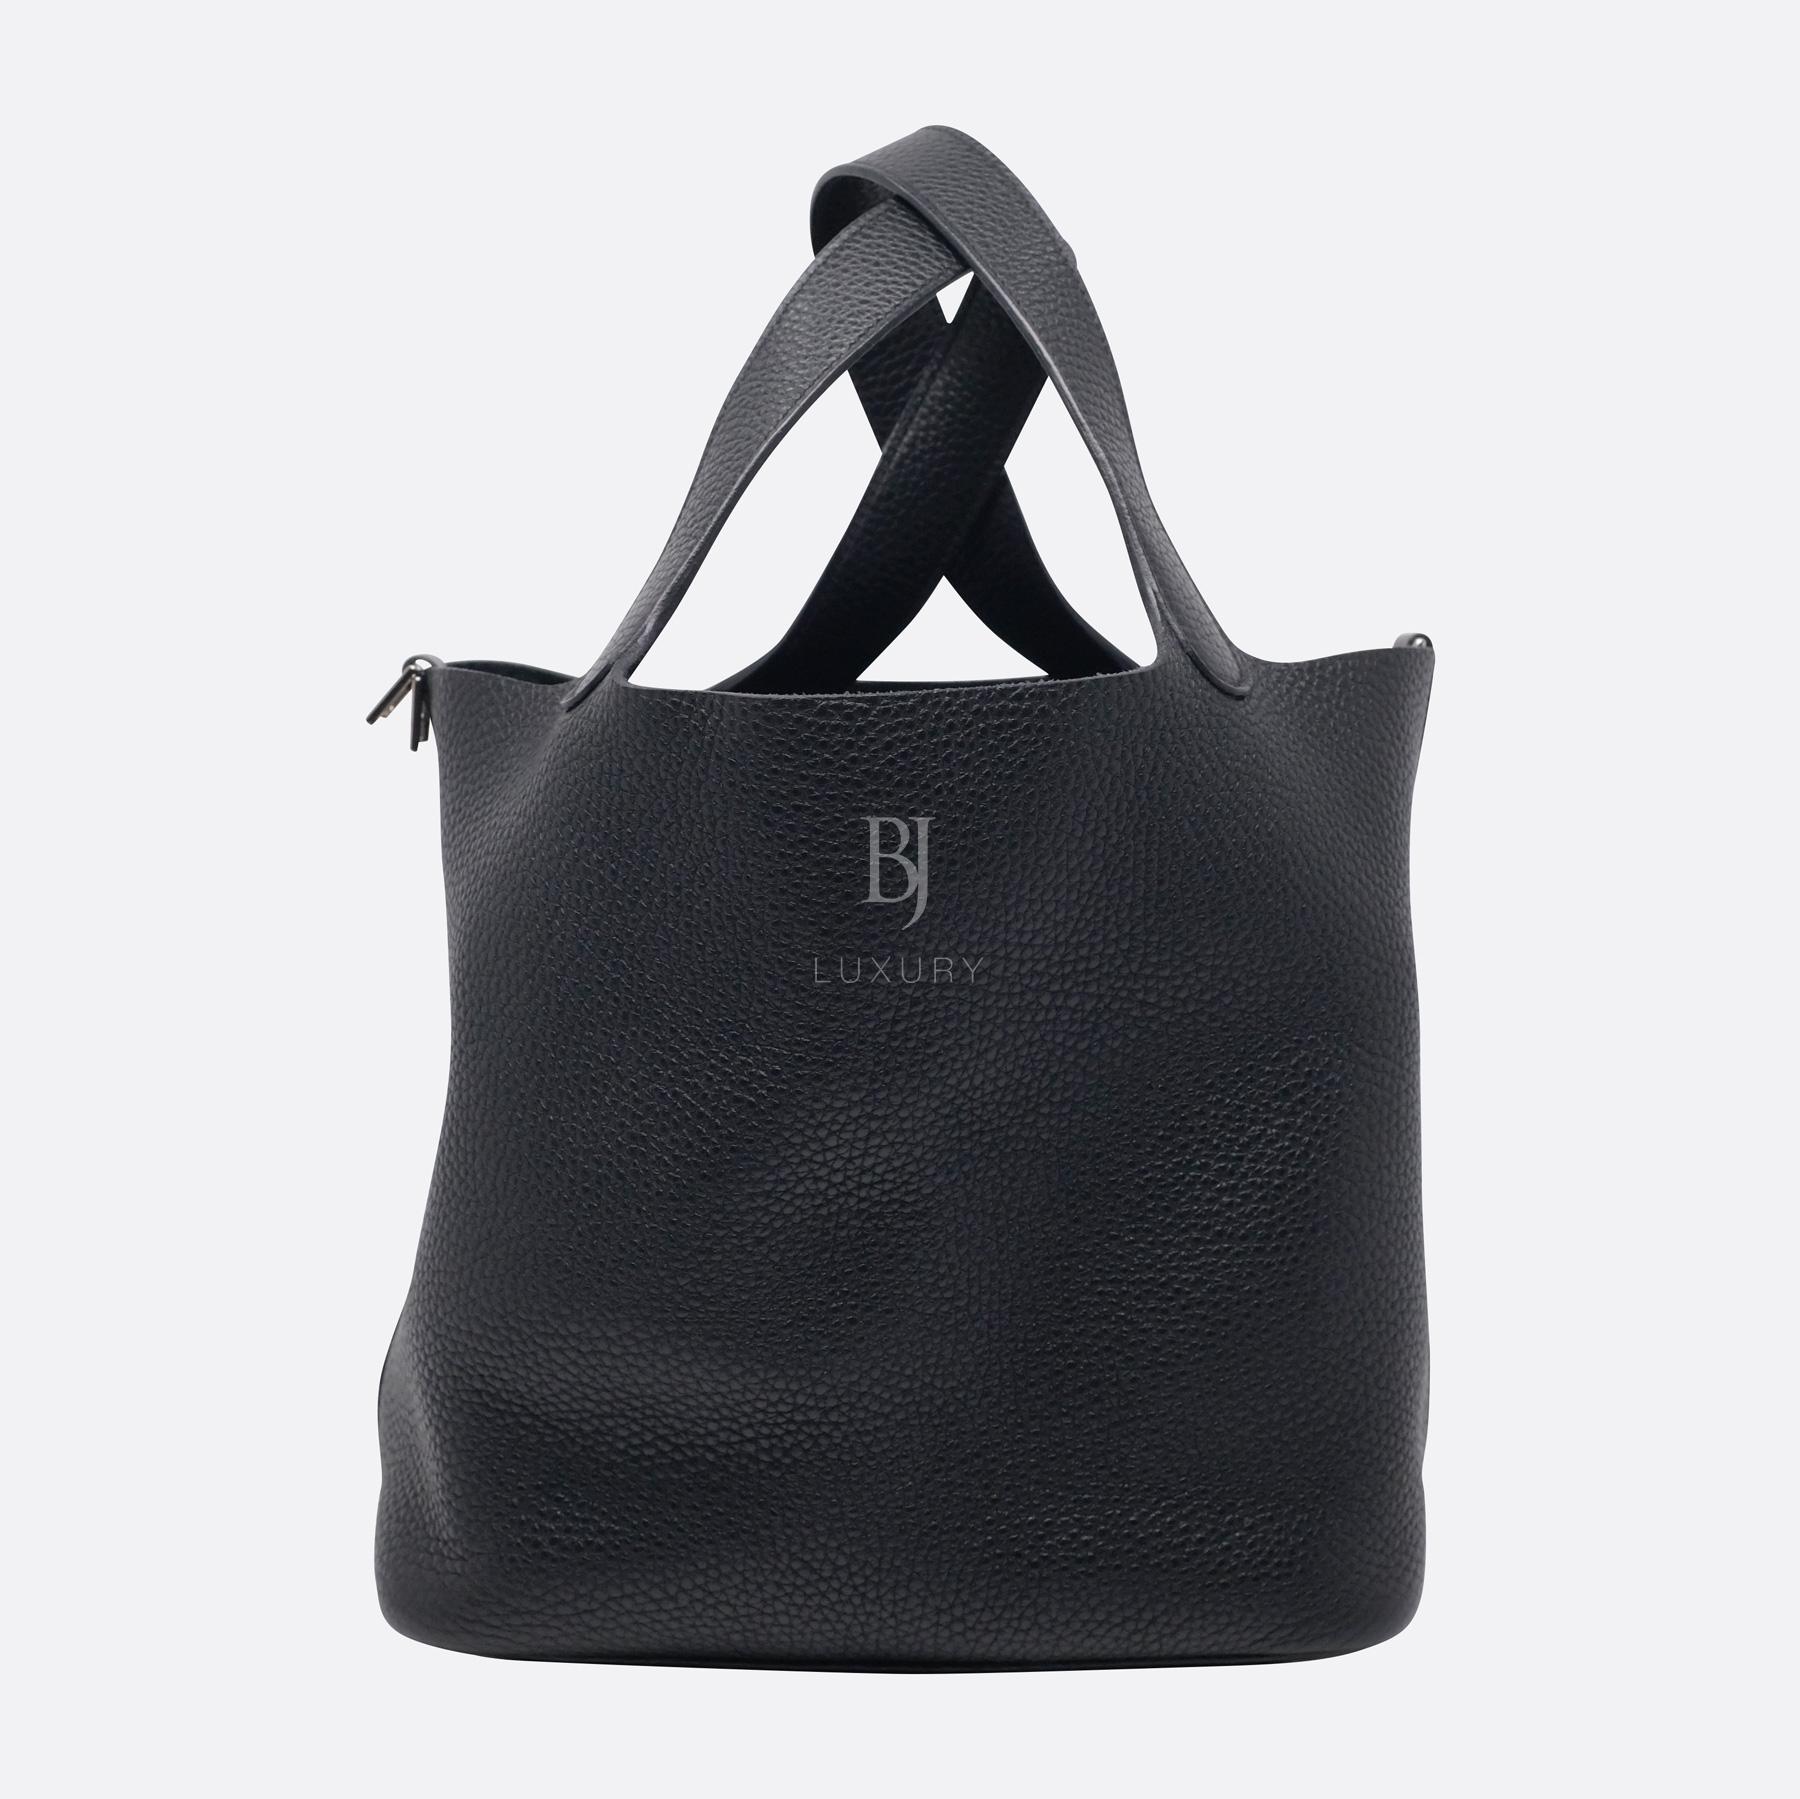 Hermes Picotin 22 Palladium Clemence BJ Luxury 5.jpg